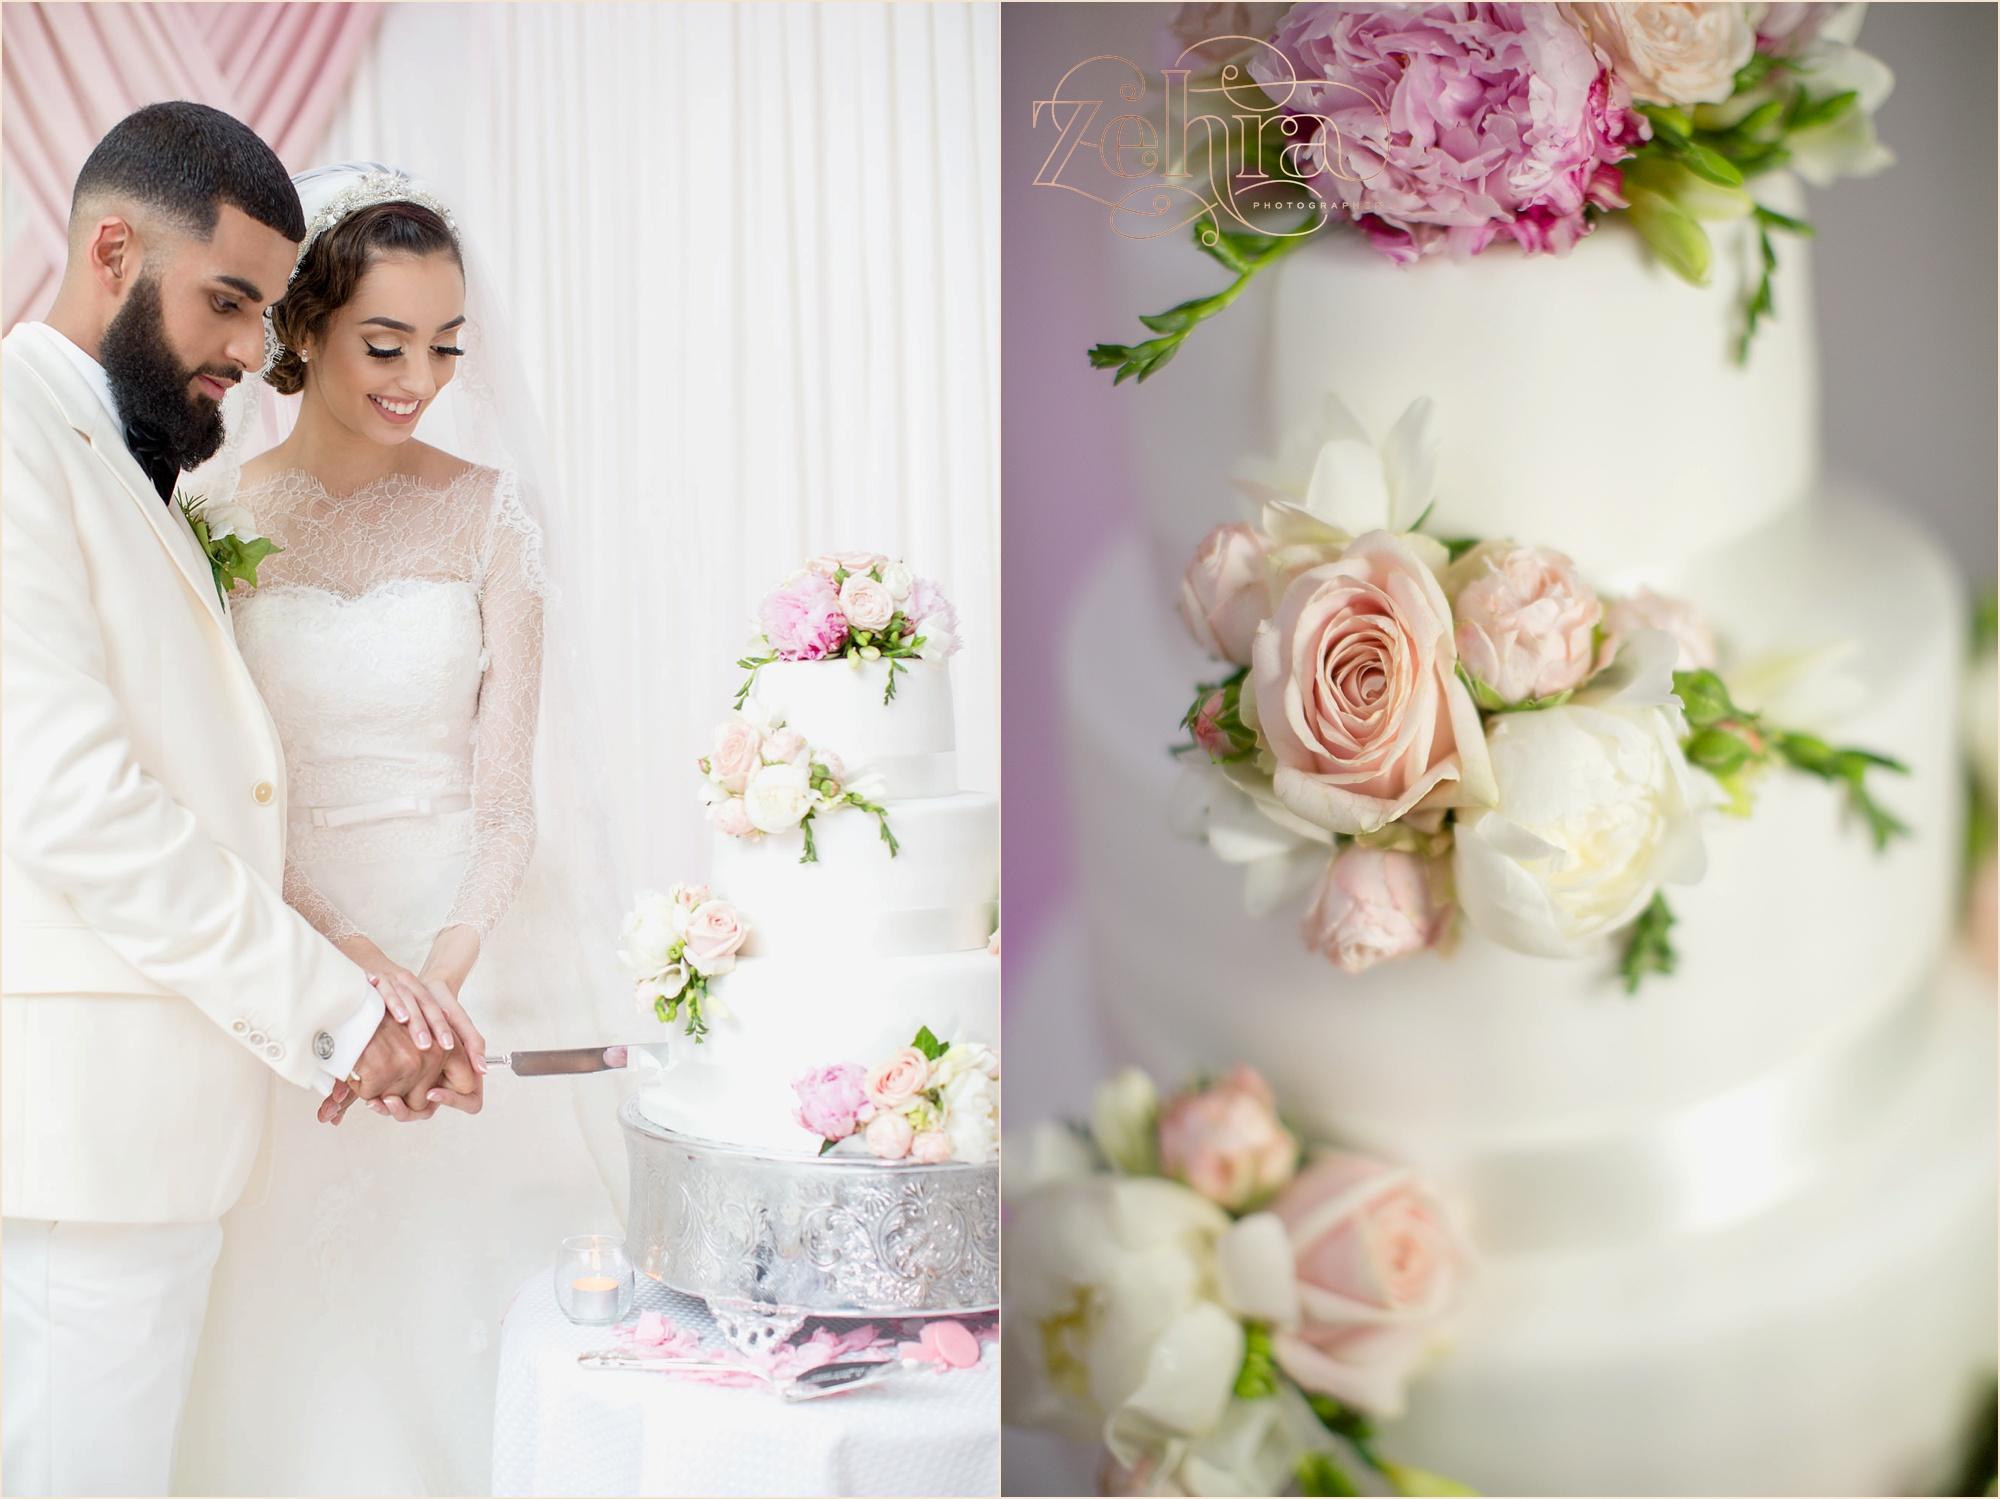 jasira manchester wedding photographer_0042.jpg